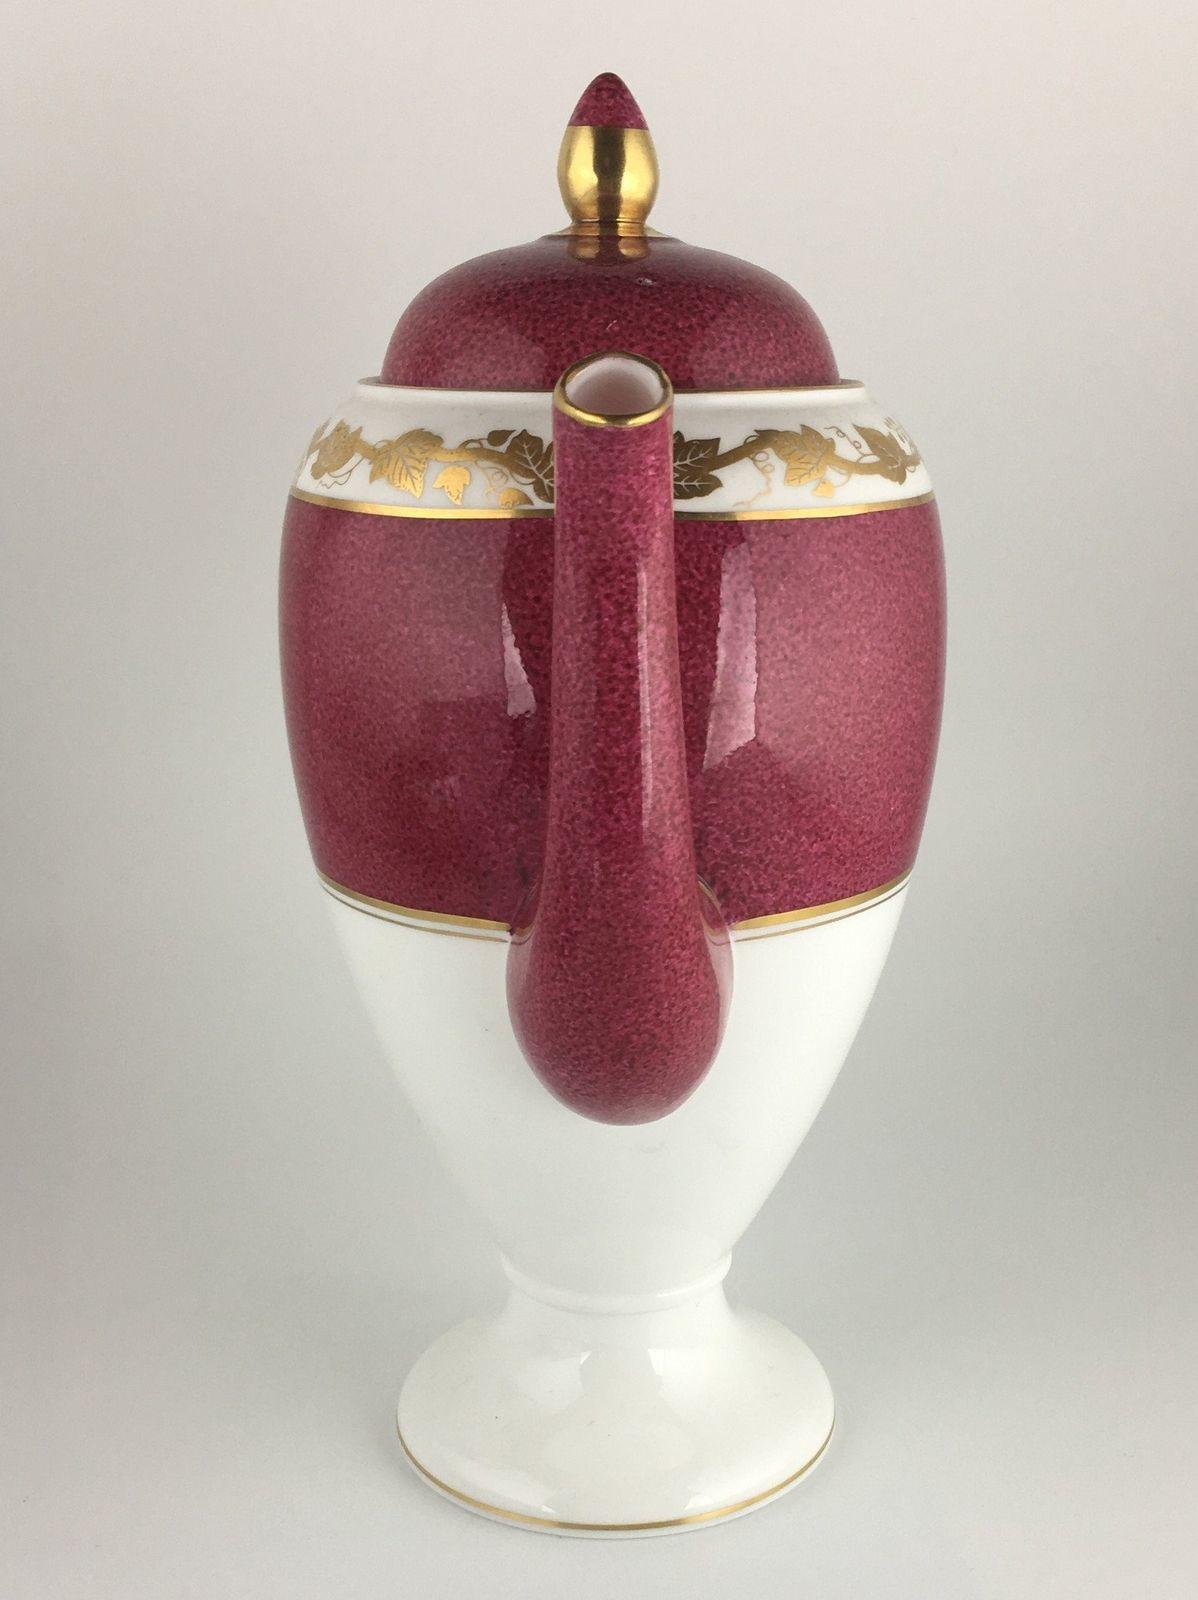 Wedgwood Whitehall Ruby W3994 Coffee pot & lid image 2